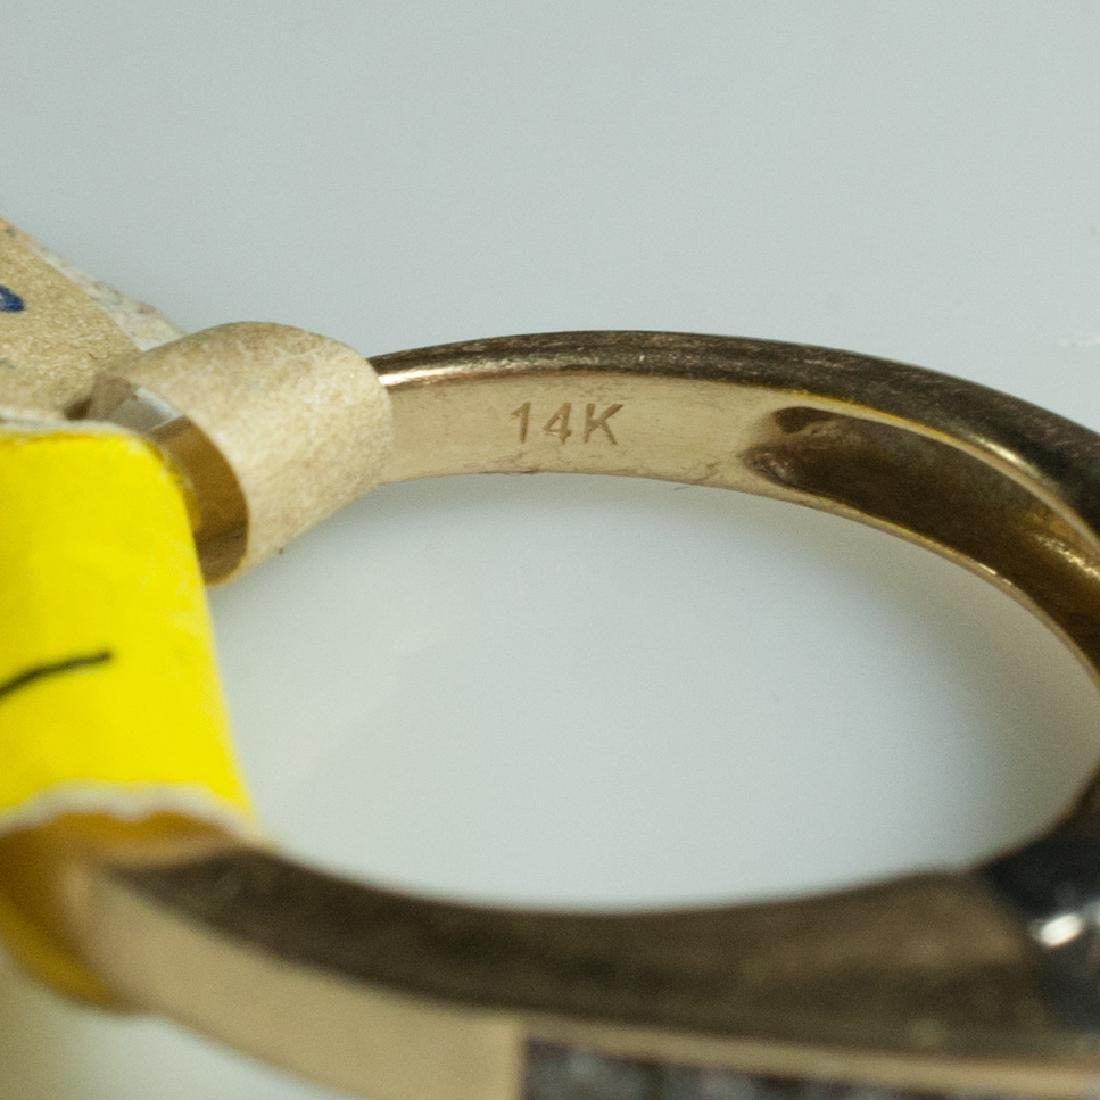 14kt Gold & Diamond Engagement Ring - 2